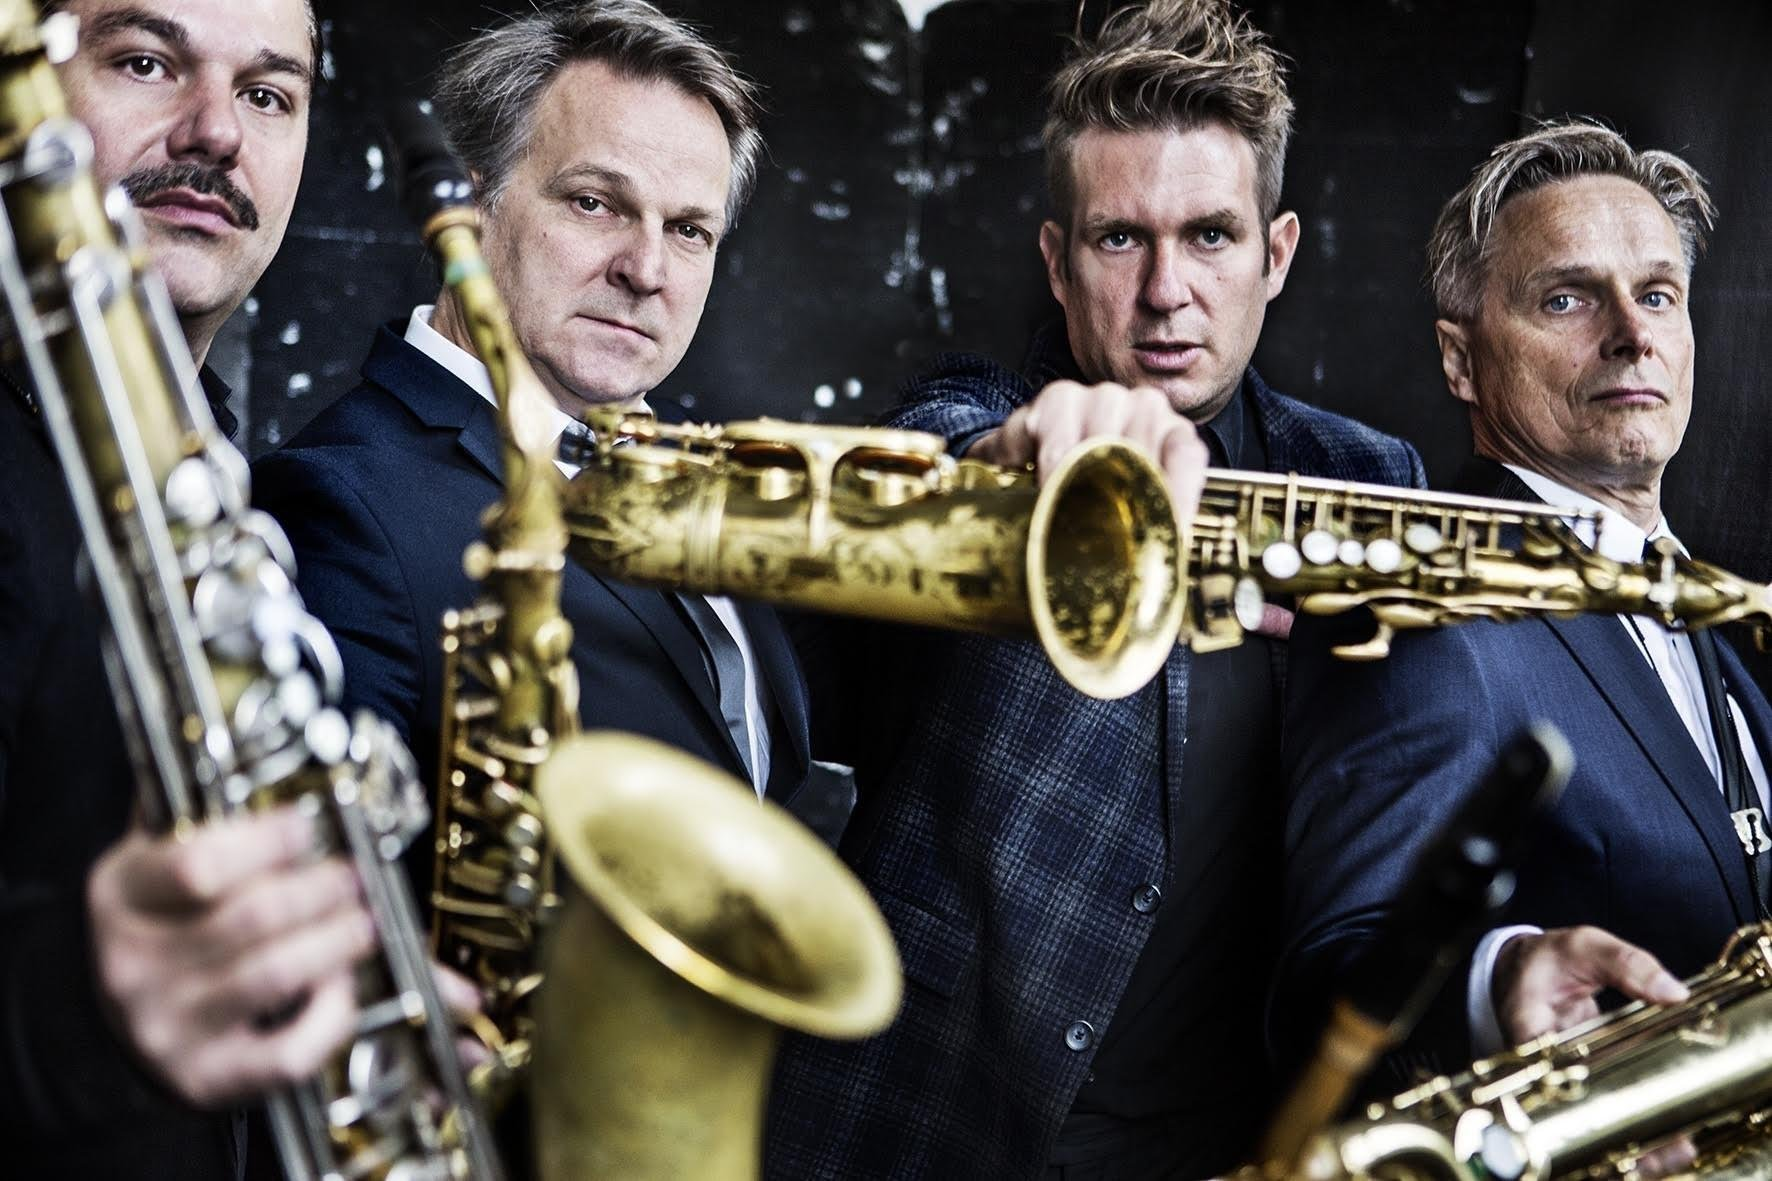 Artvark Saxophone Quartet graaft in 'Trance' naar muzikale schatten